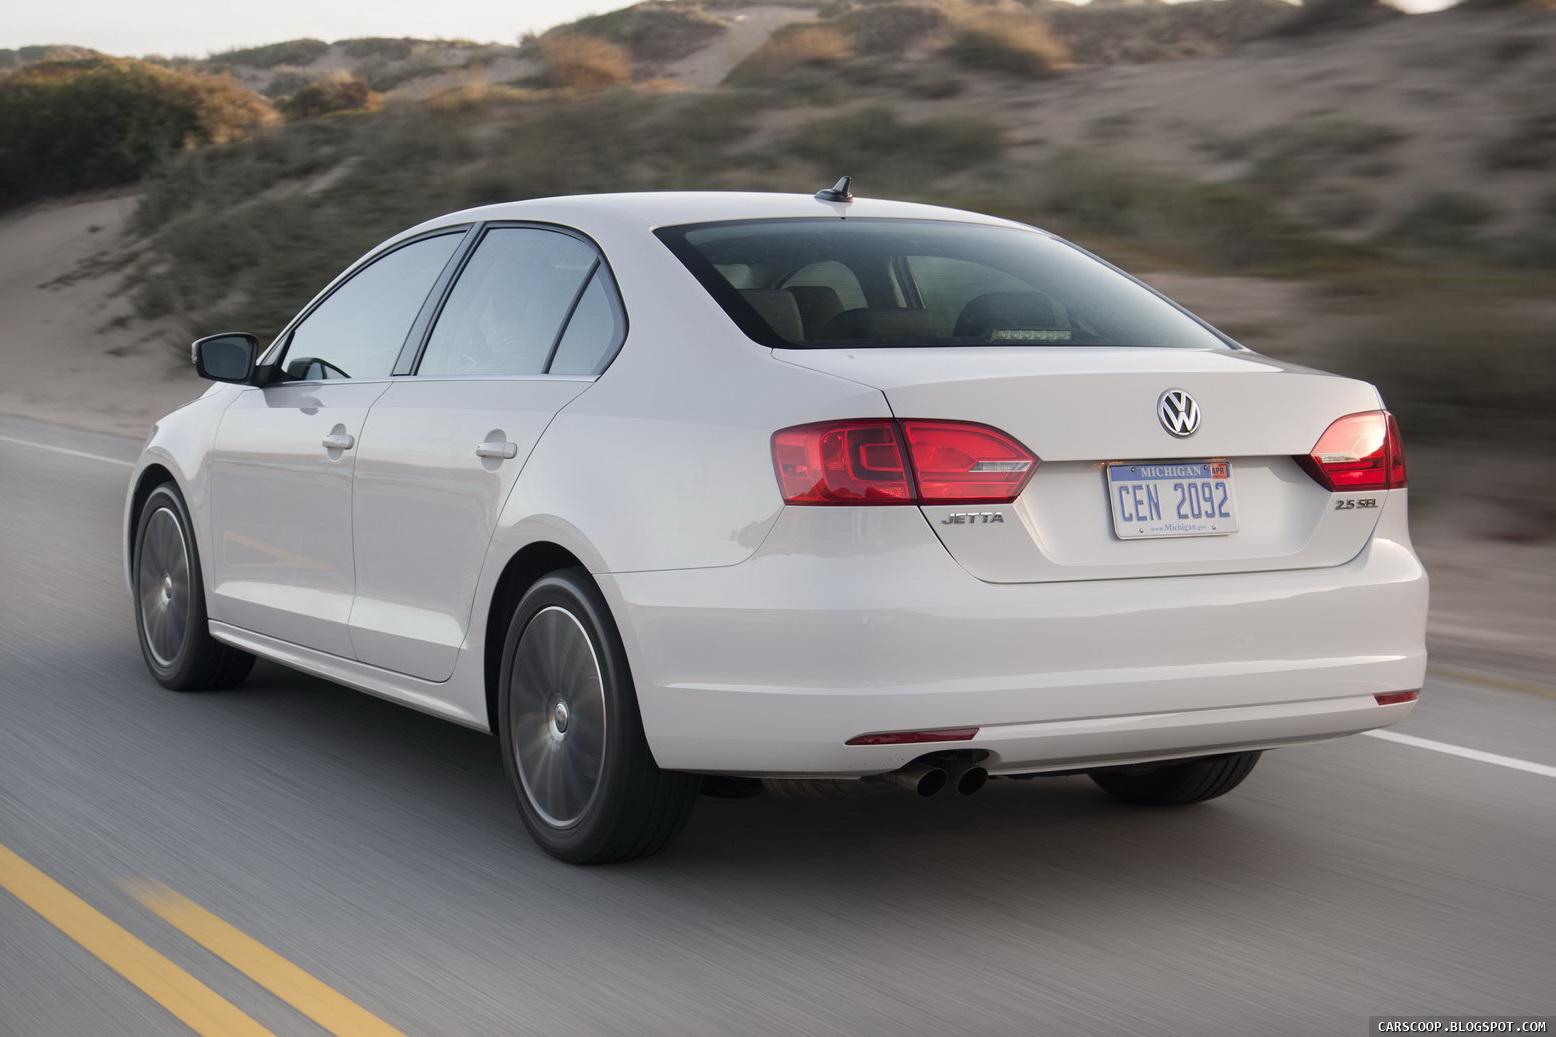 VW vw jetta 1.2 tsi specs : 2011 Volkswagen Jetta: Performance Specs and New Photo Gallery